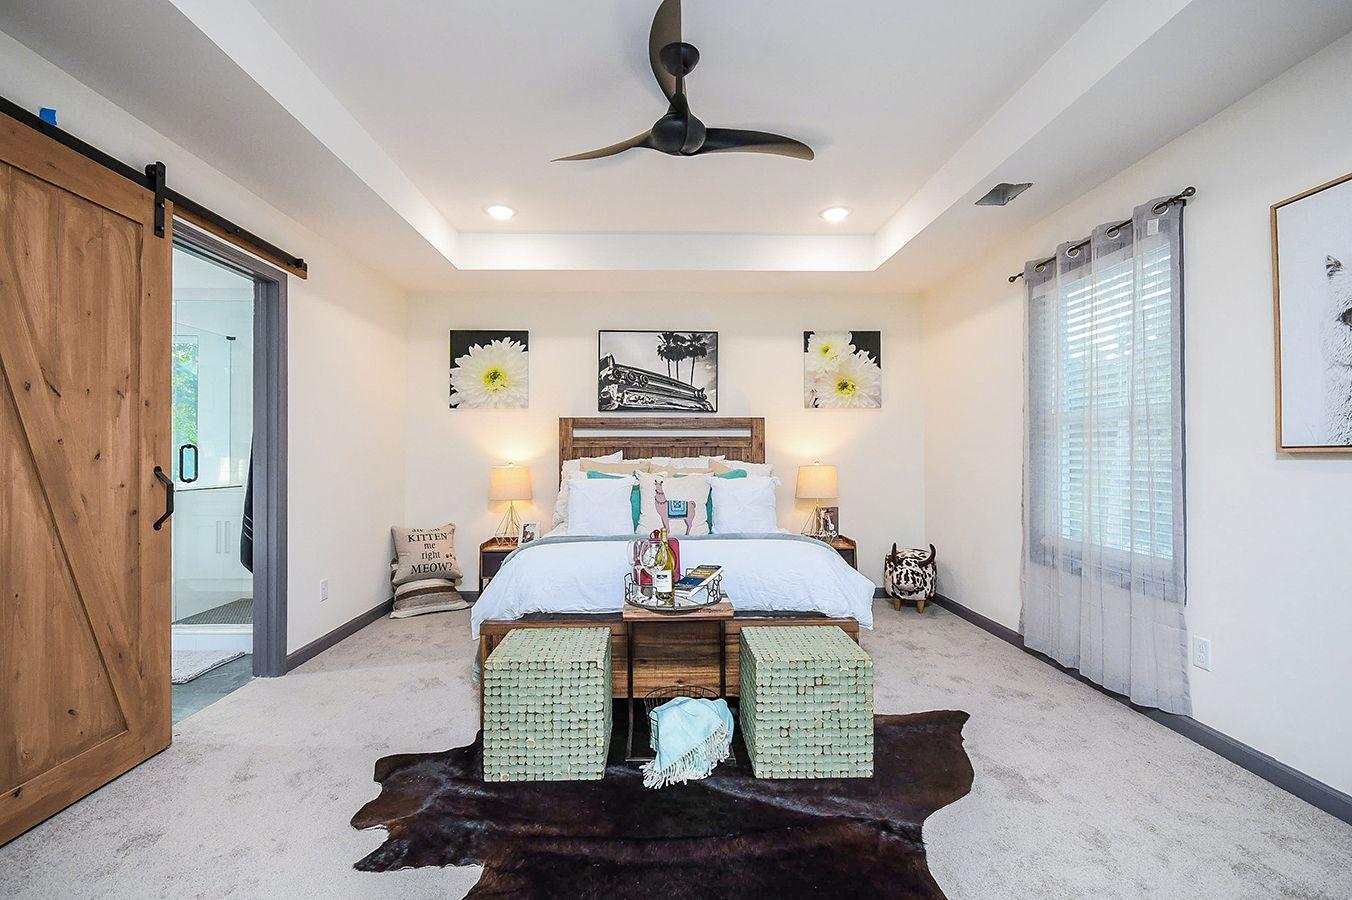 Upper_Level_Master_Bedroom_view2 (2).jpg